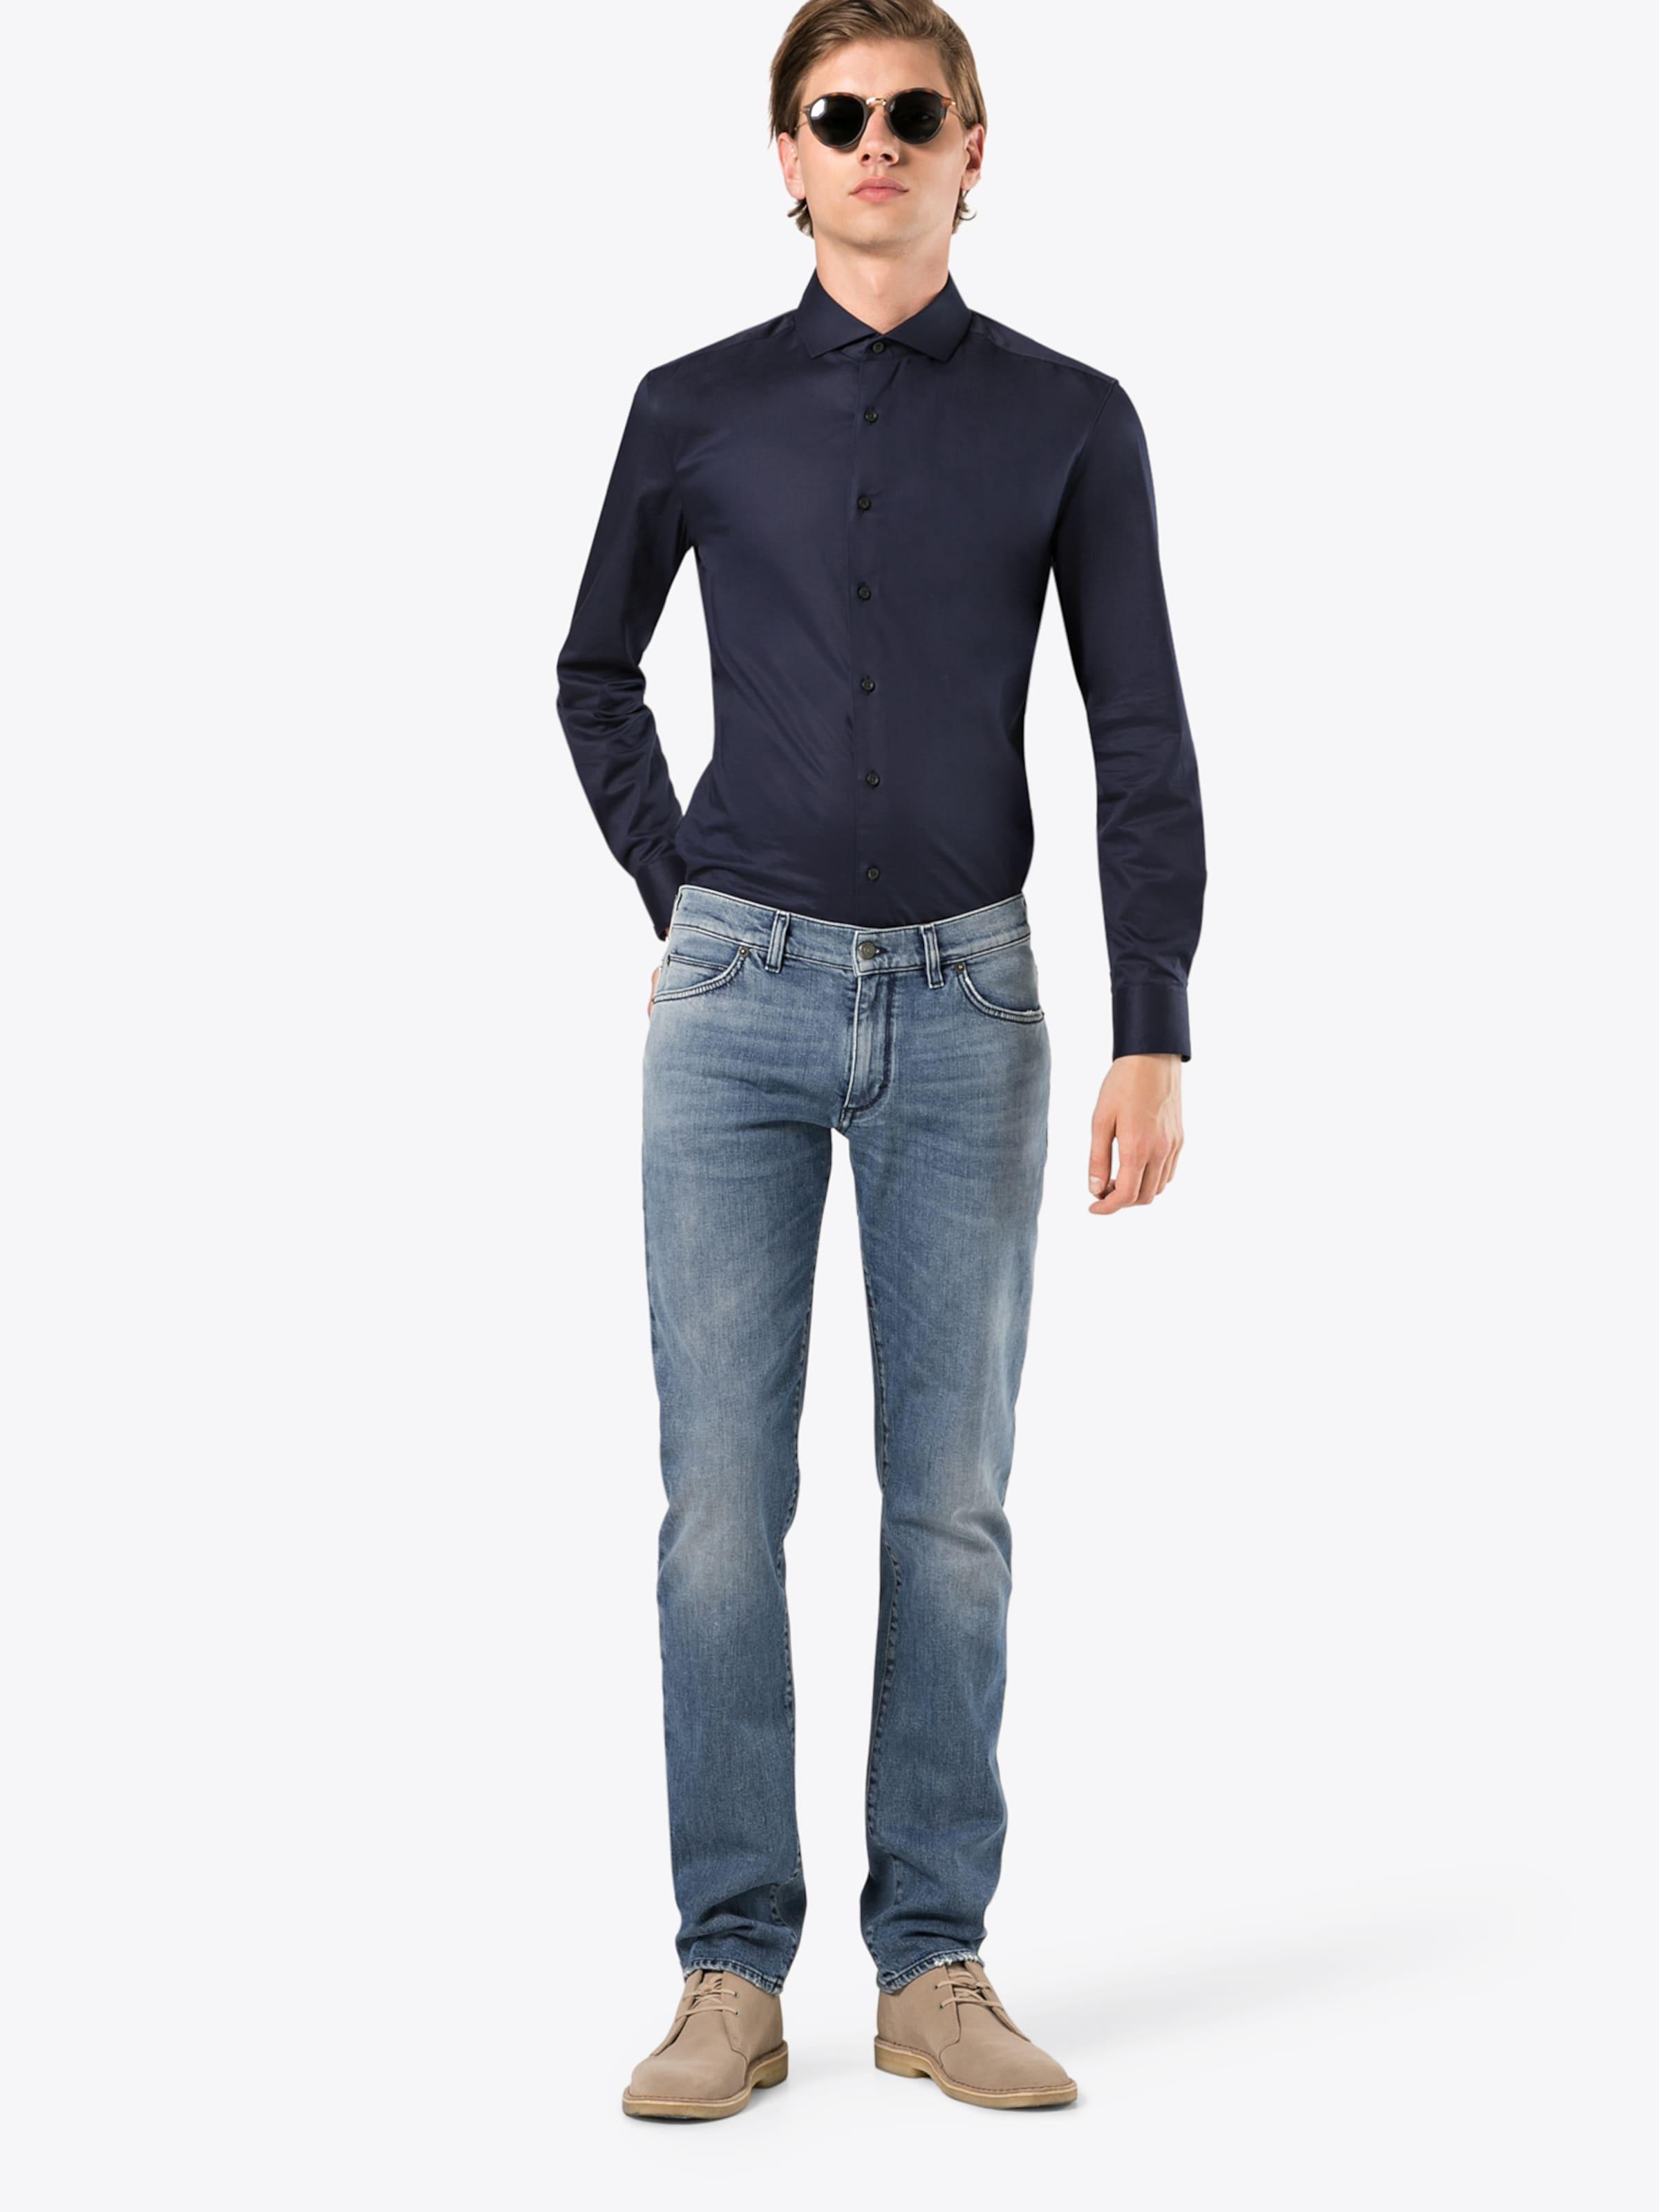 pocket Drykorn Denim Blue 5 jeans 'jaw' In JKT1clF